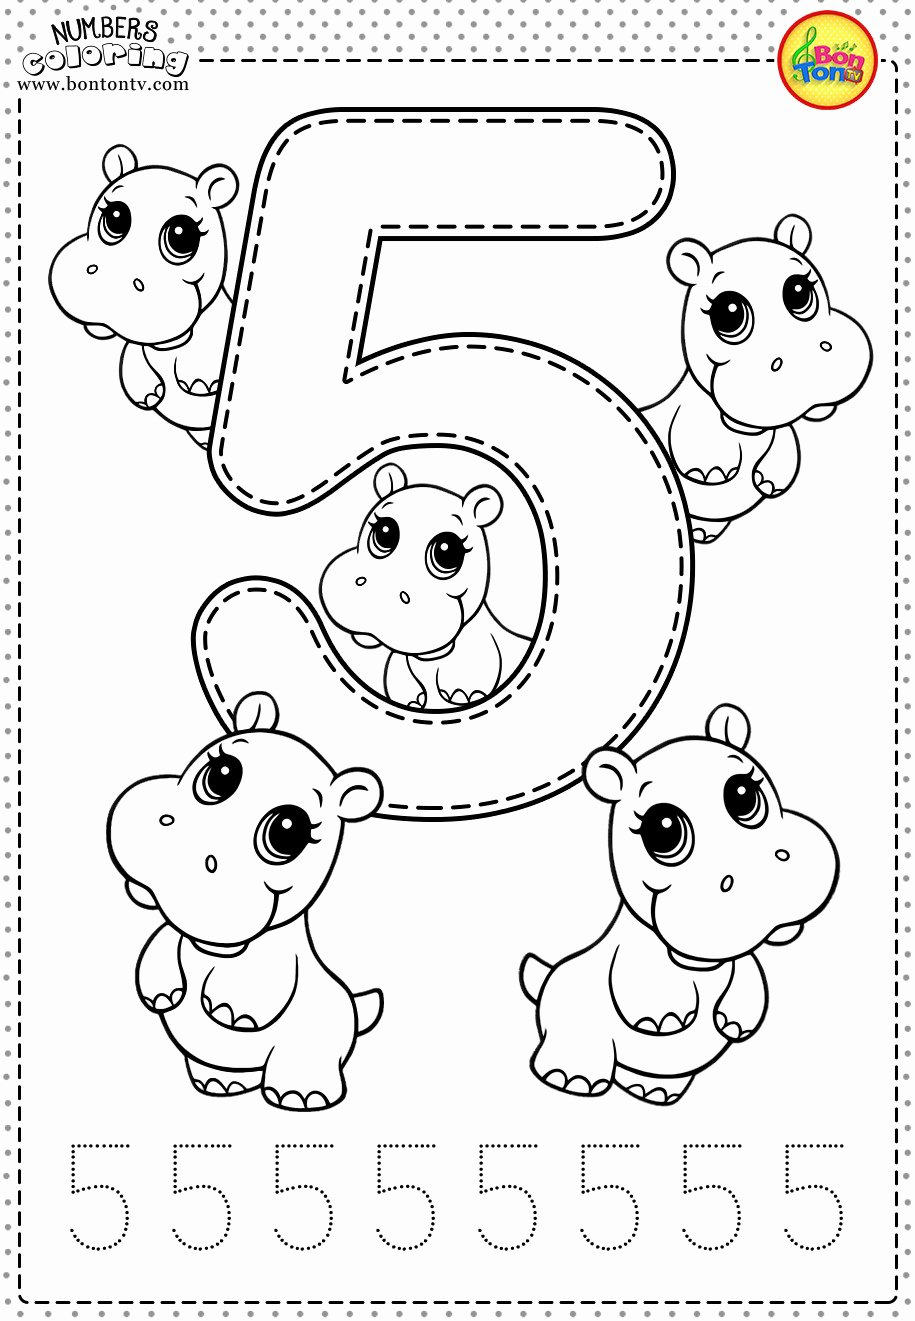 Number Coloring Worksheets for Preschoolers Fresh Number Coloring Worksheets Schools Preschool Printable